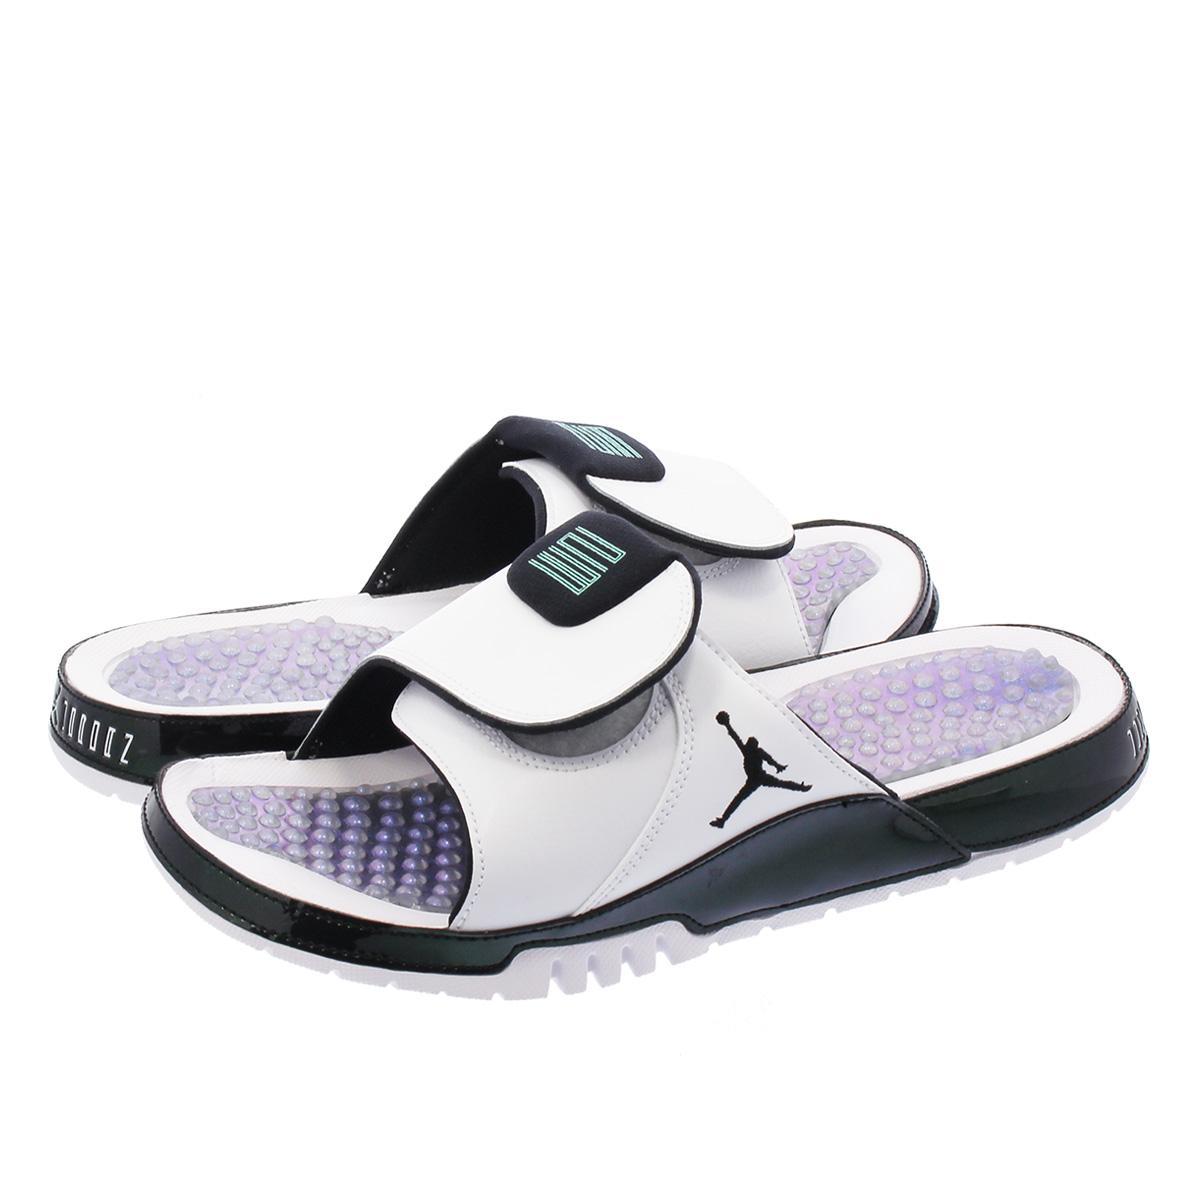 593bc5910a07 NIKE JORDAN HYDRO XI RETRO Nike Jordan high mud 3 nostalgic WHITE EMERALD  RISE BLACK aa1336-117